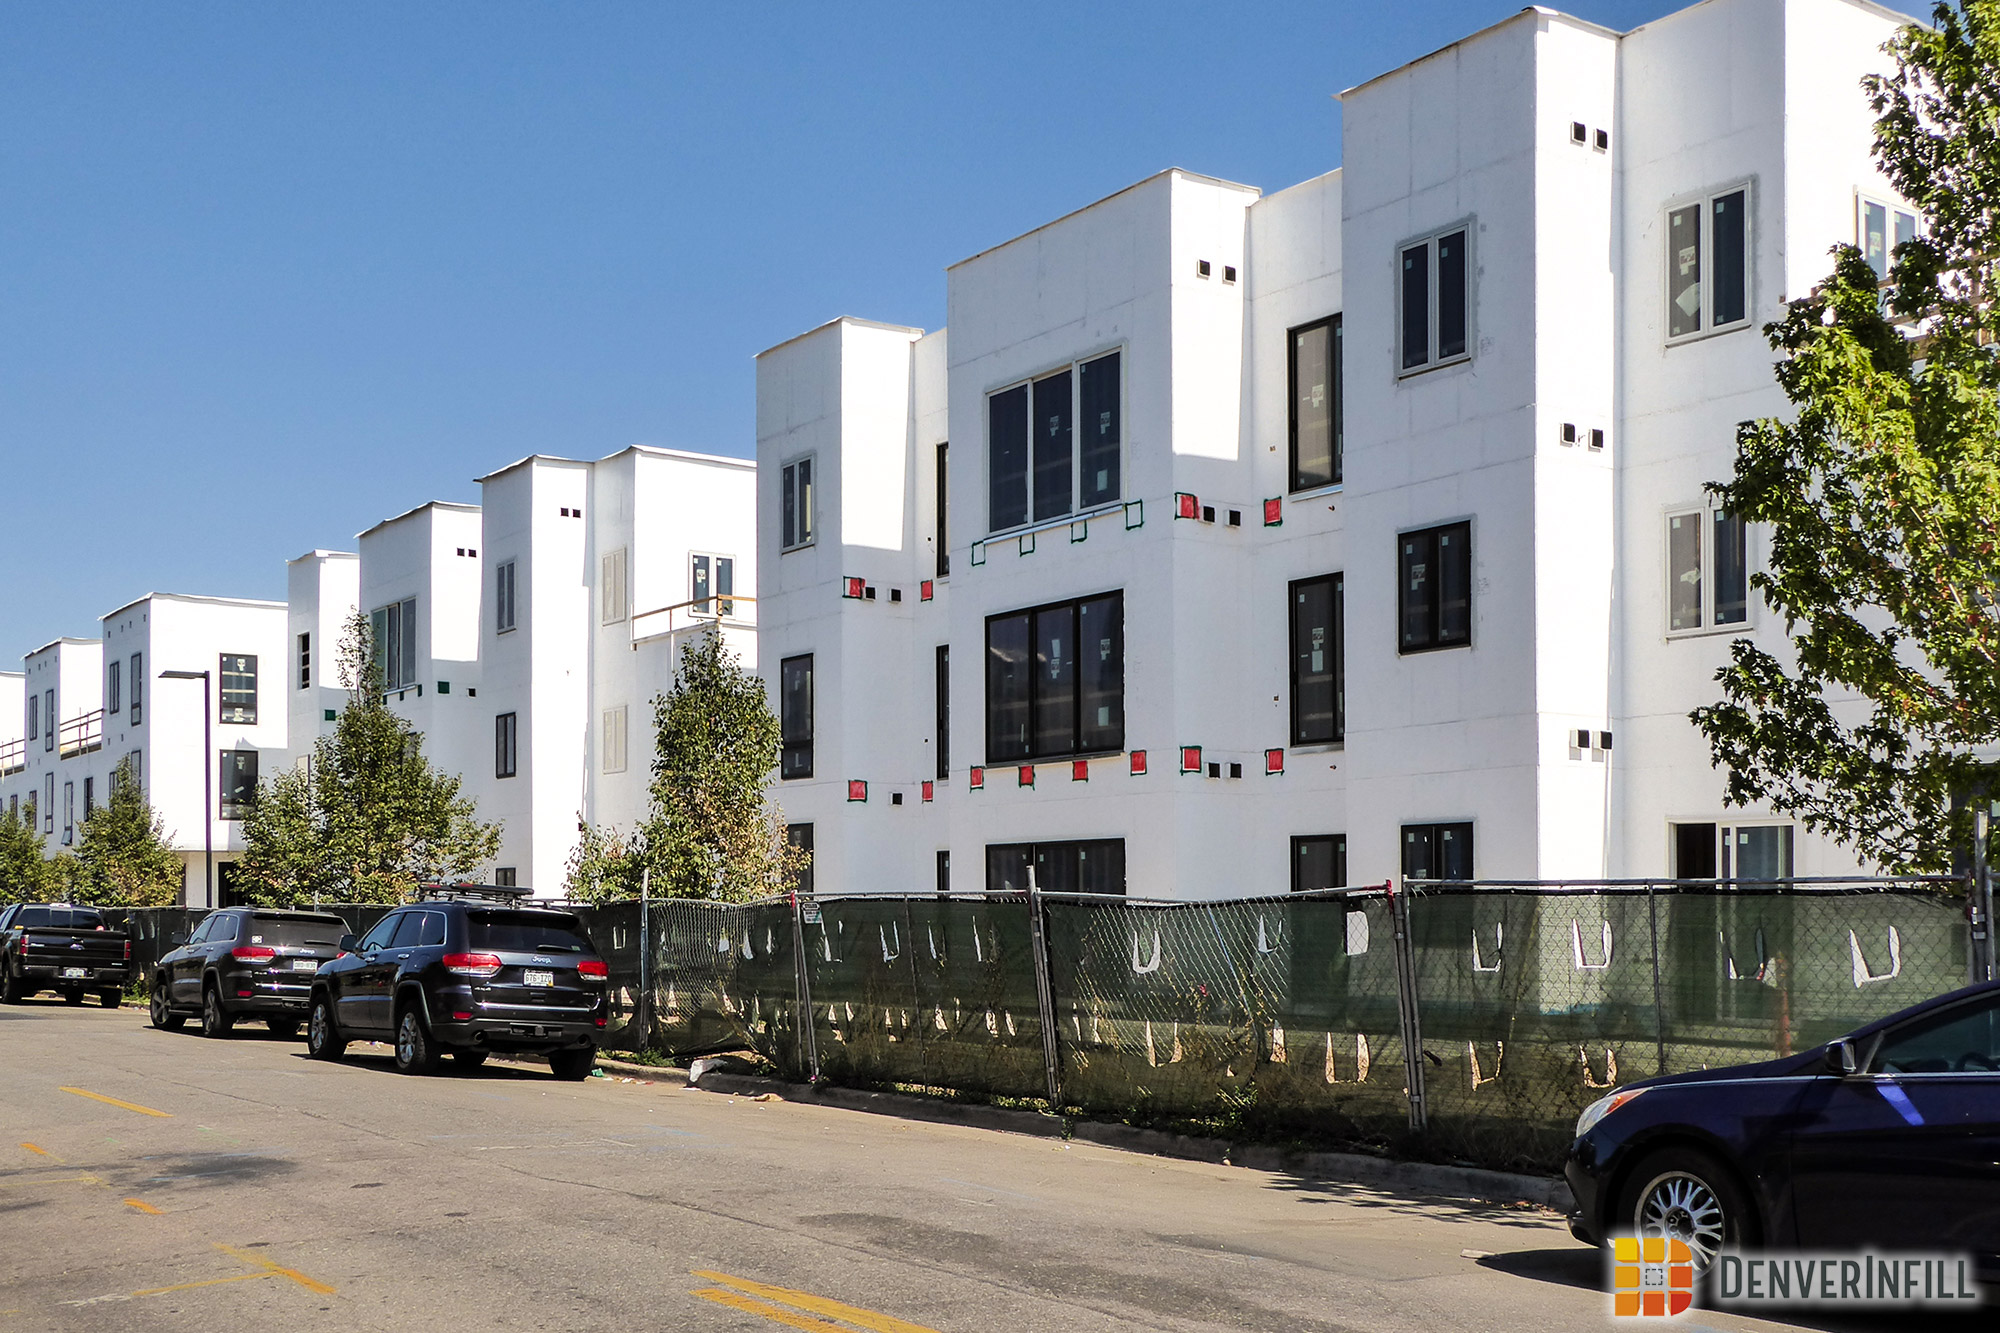 S*Park condominiums along Lawrence